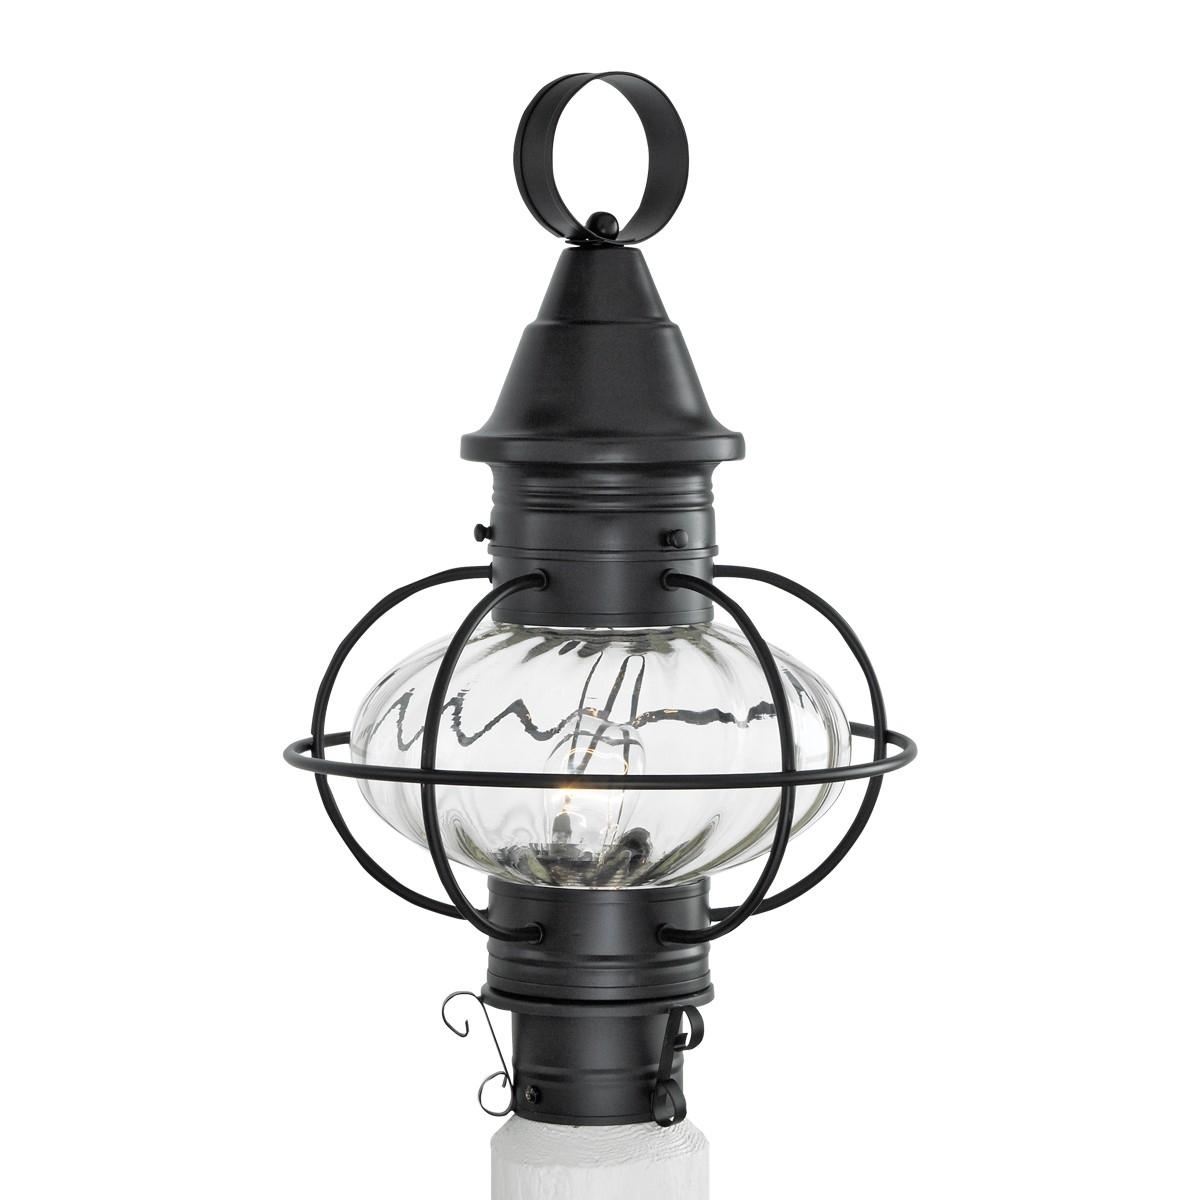 Vidalia Outdoor Glass Onion Post Light within Outdoor Lighting Onion Lanterns (Image 20 of 20)